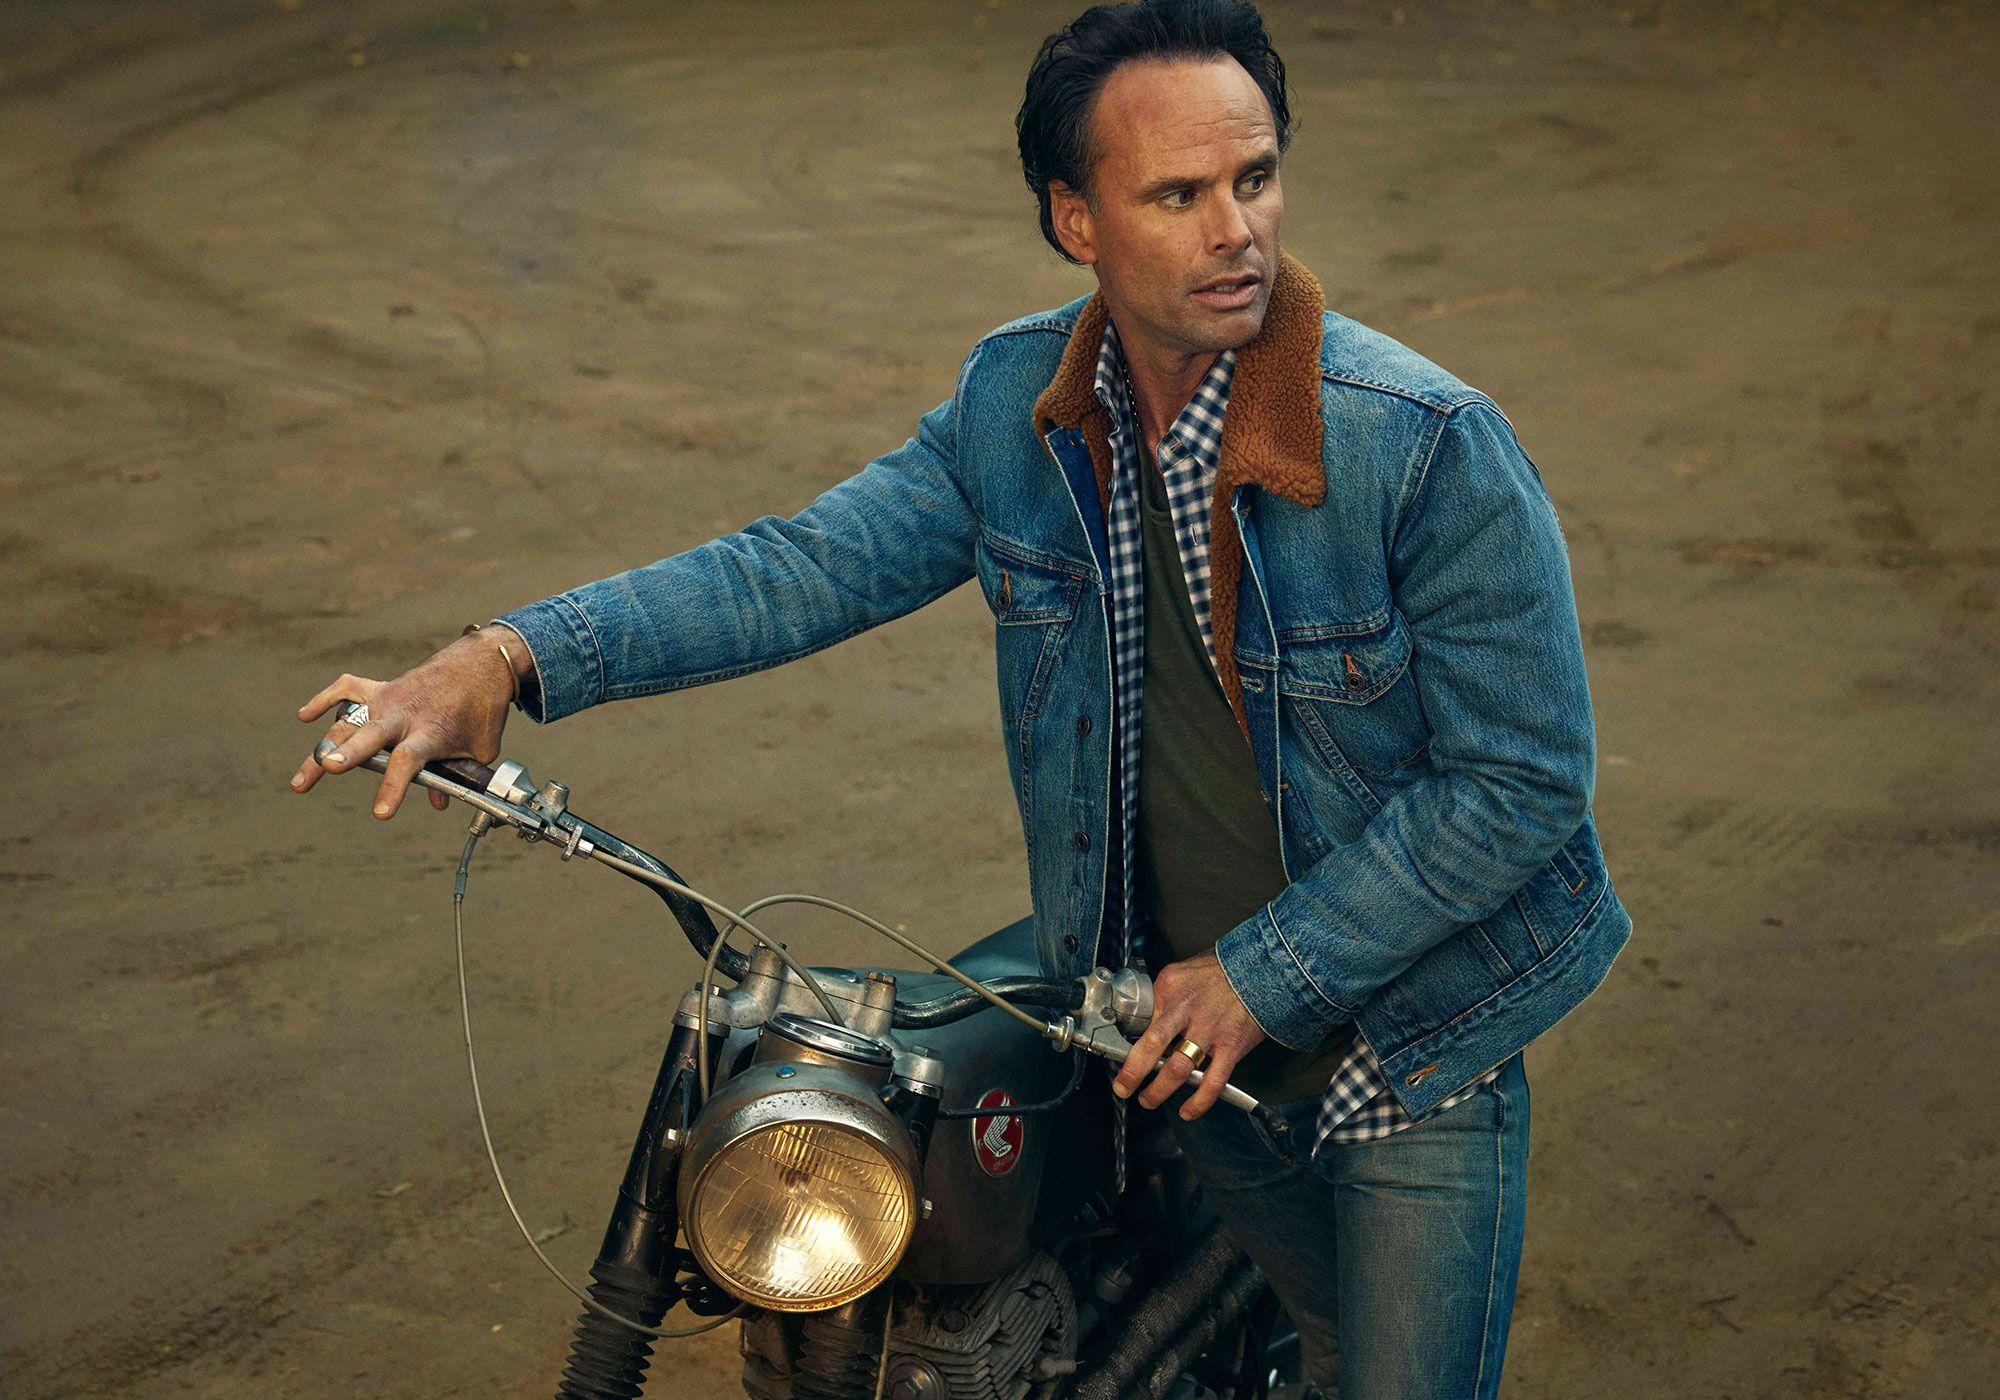 Walton Goggins wearing denim and riding a motorcycle.